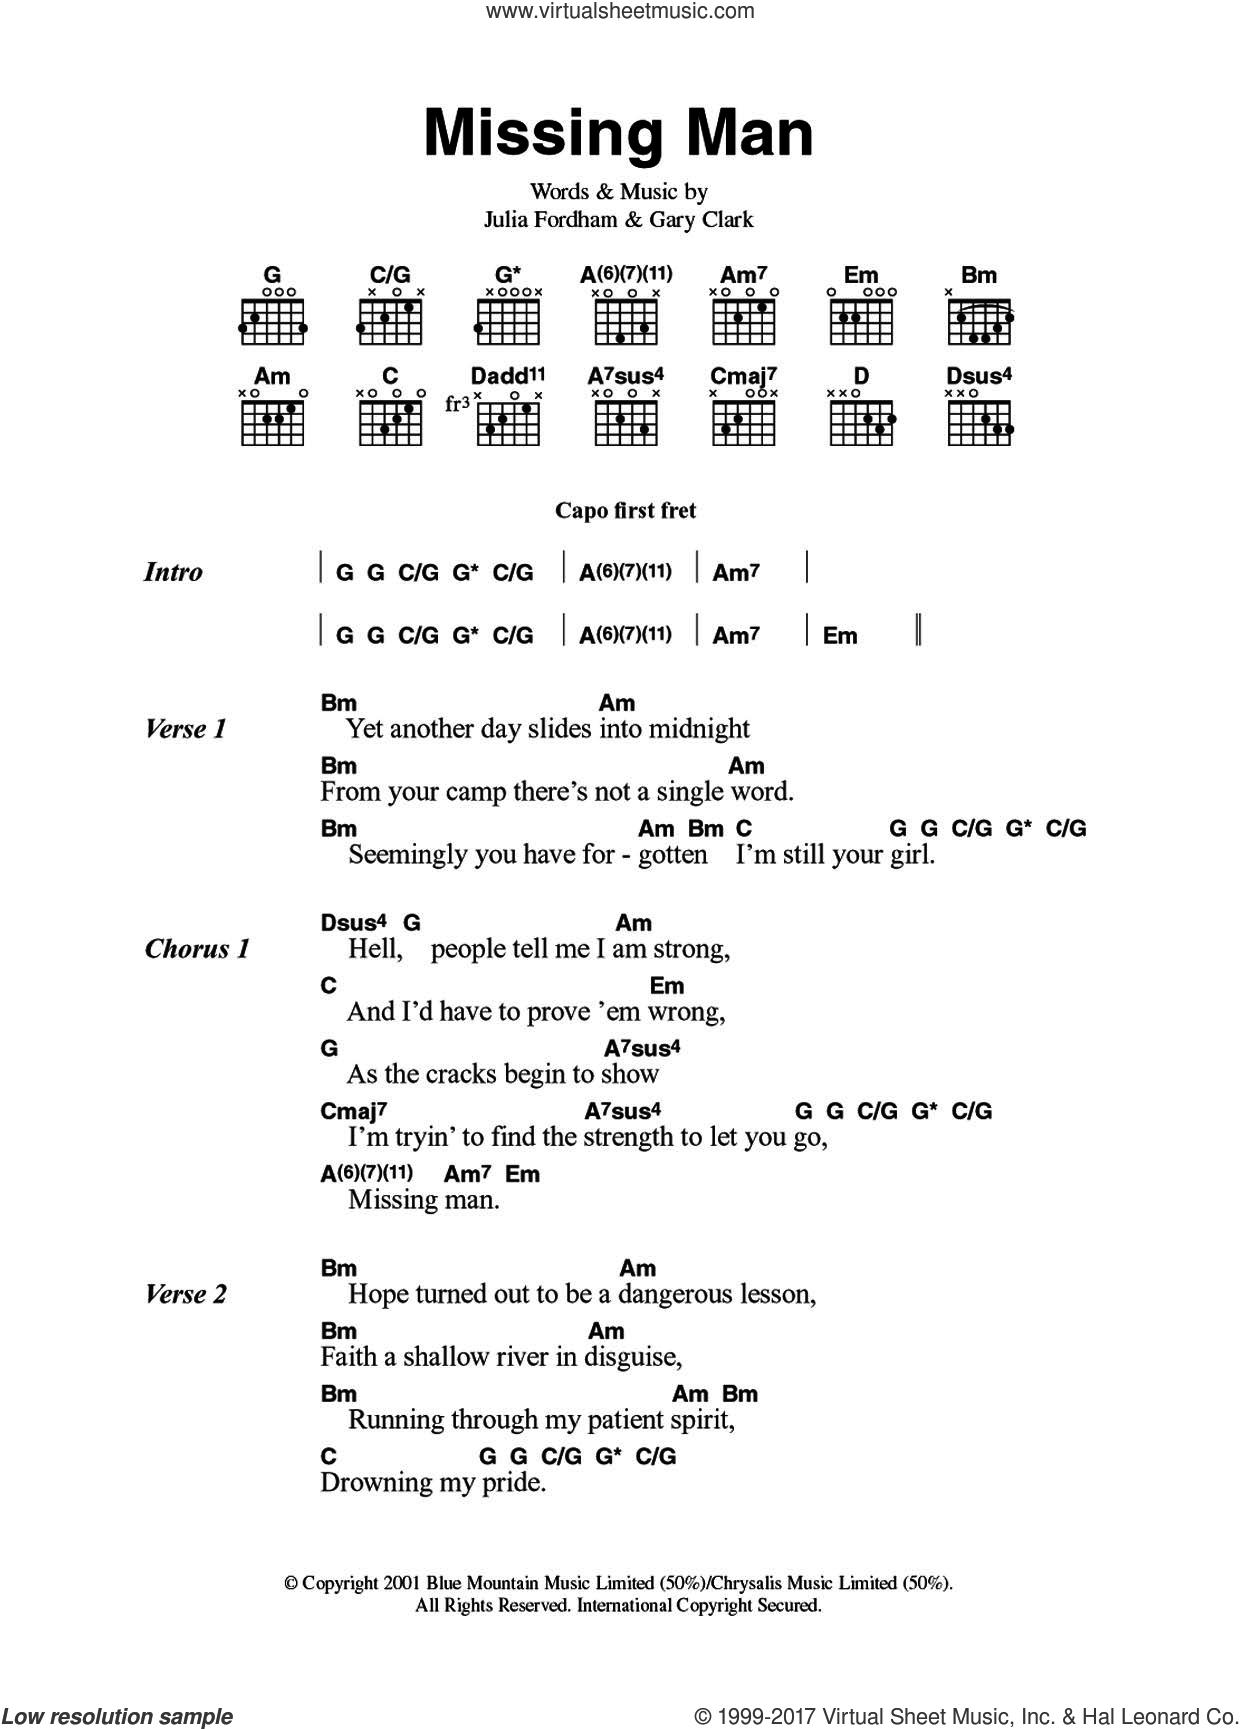 Fordham - Missing Man sheet music for guitar (chords) [PDF]